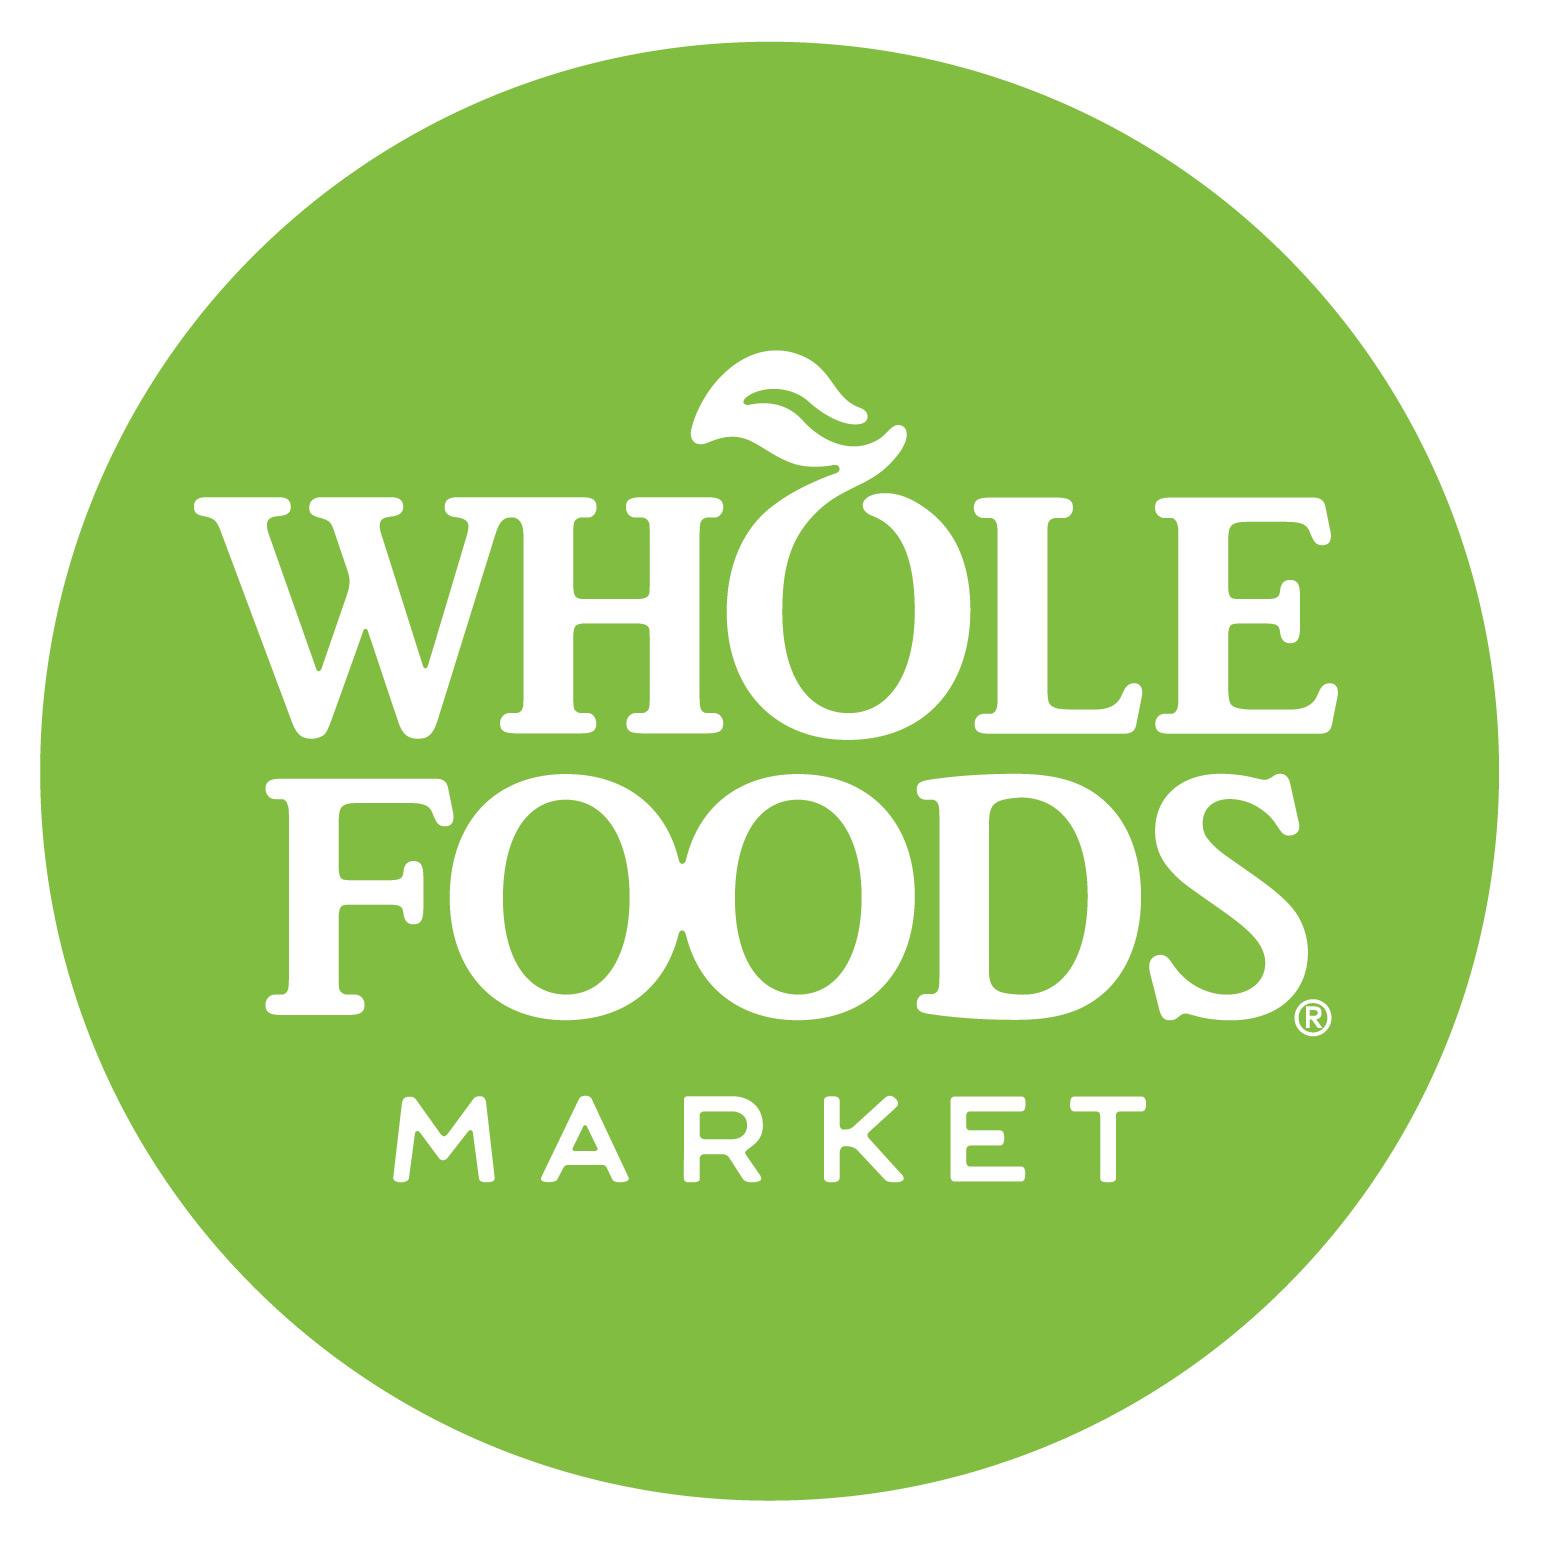 Whole Foods Market Twitter